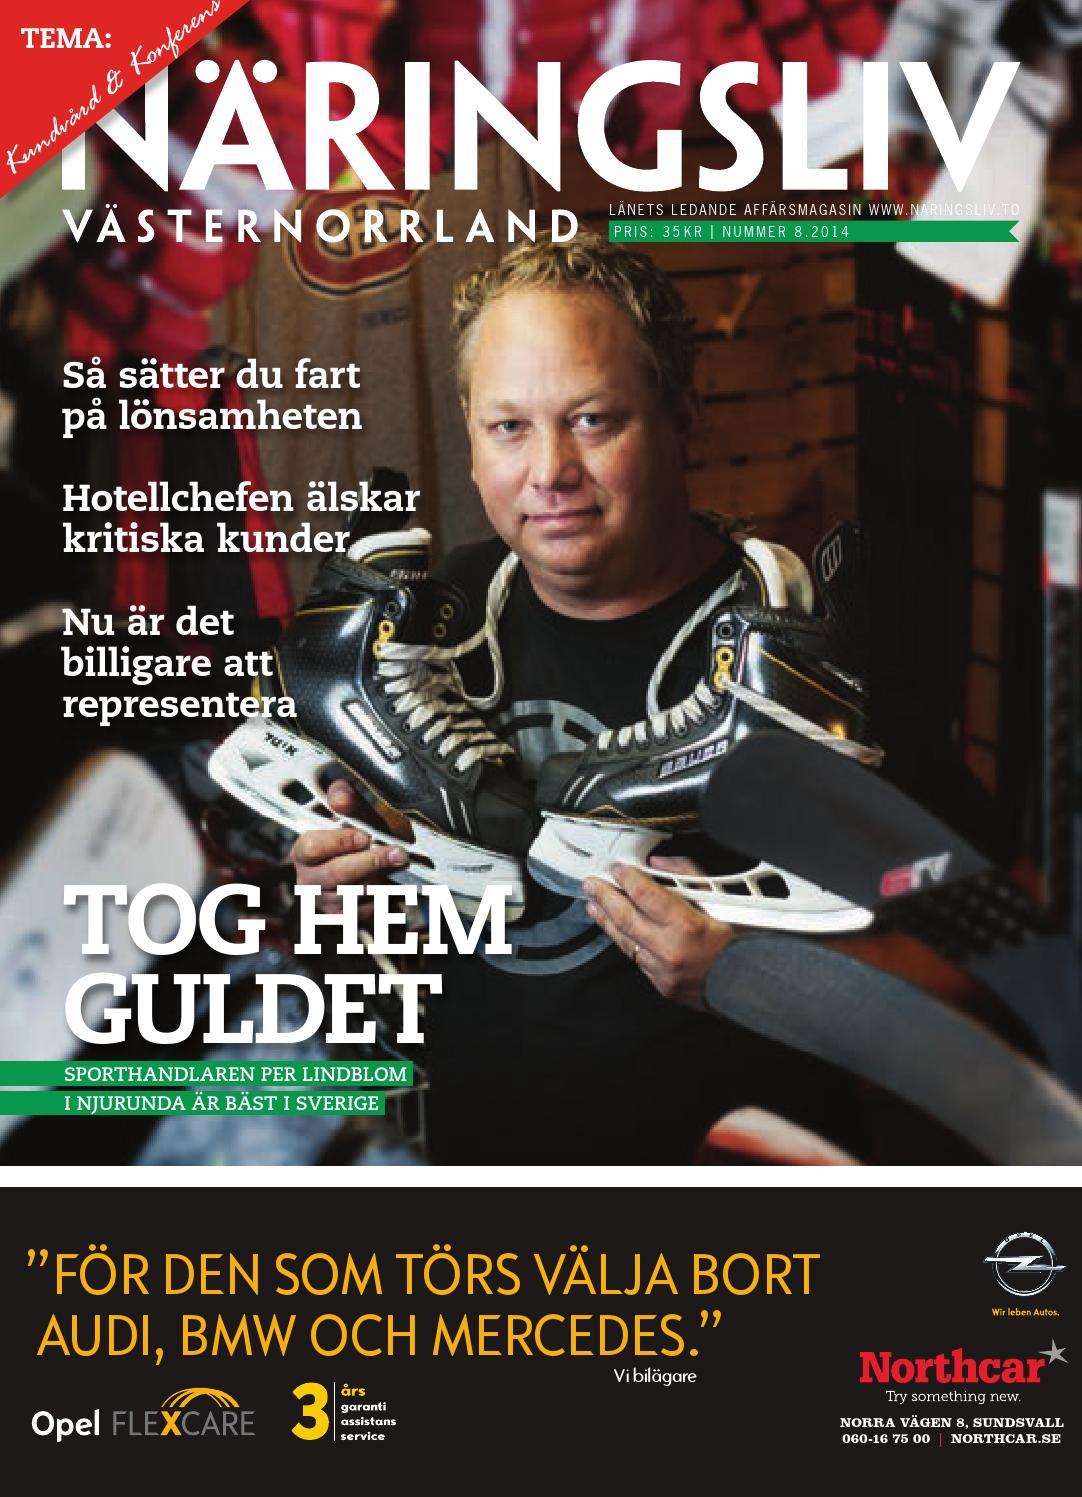 Näringsliv nr 5 2014 by olof axelsson   issuu